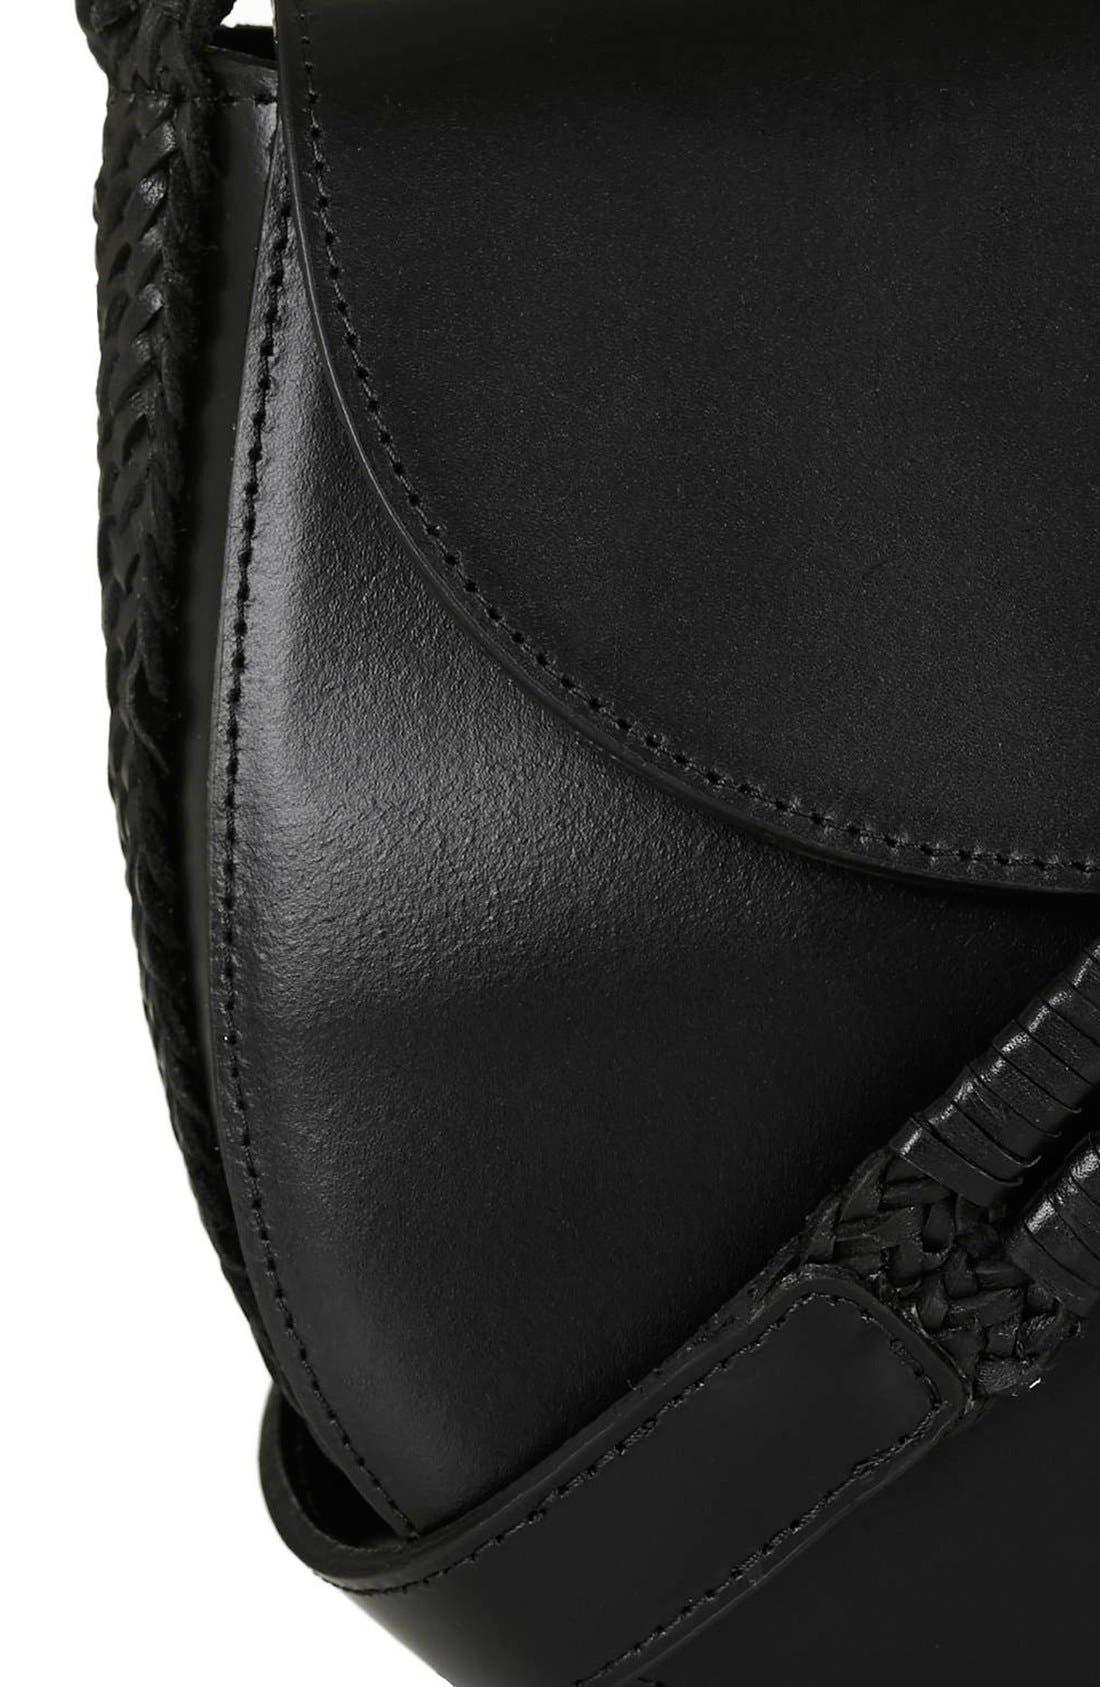 TOPSHOP, Woven Strap Leather Saddle Bag, Alternate thumbnail 4, color, 001